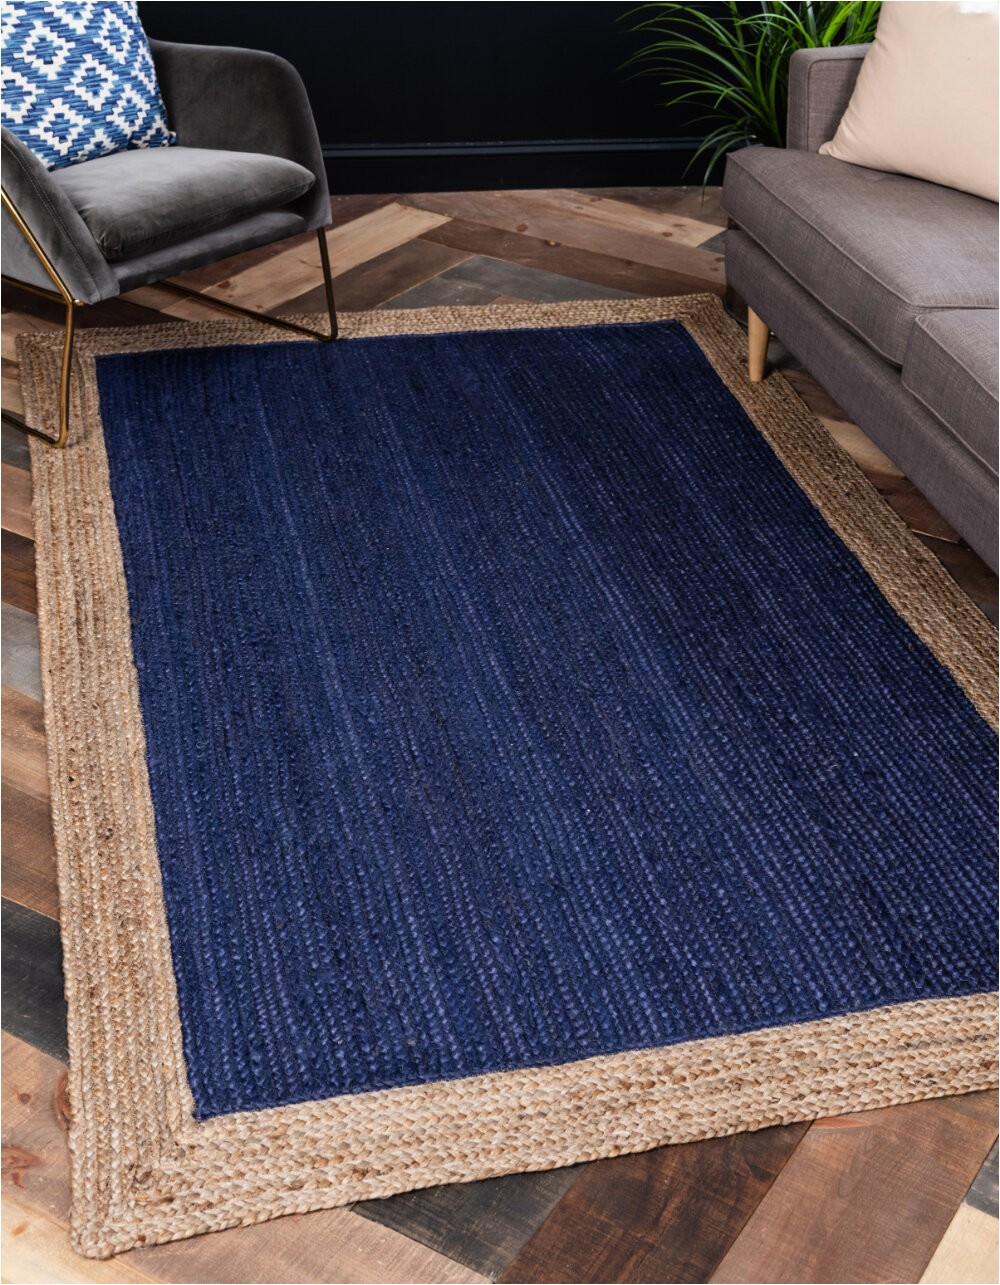 calathea hand braided navy blue area rug bchh6866 piid=0